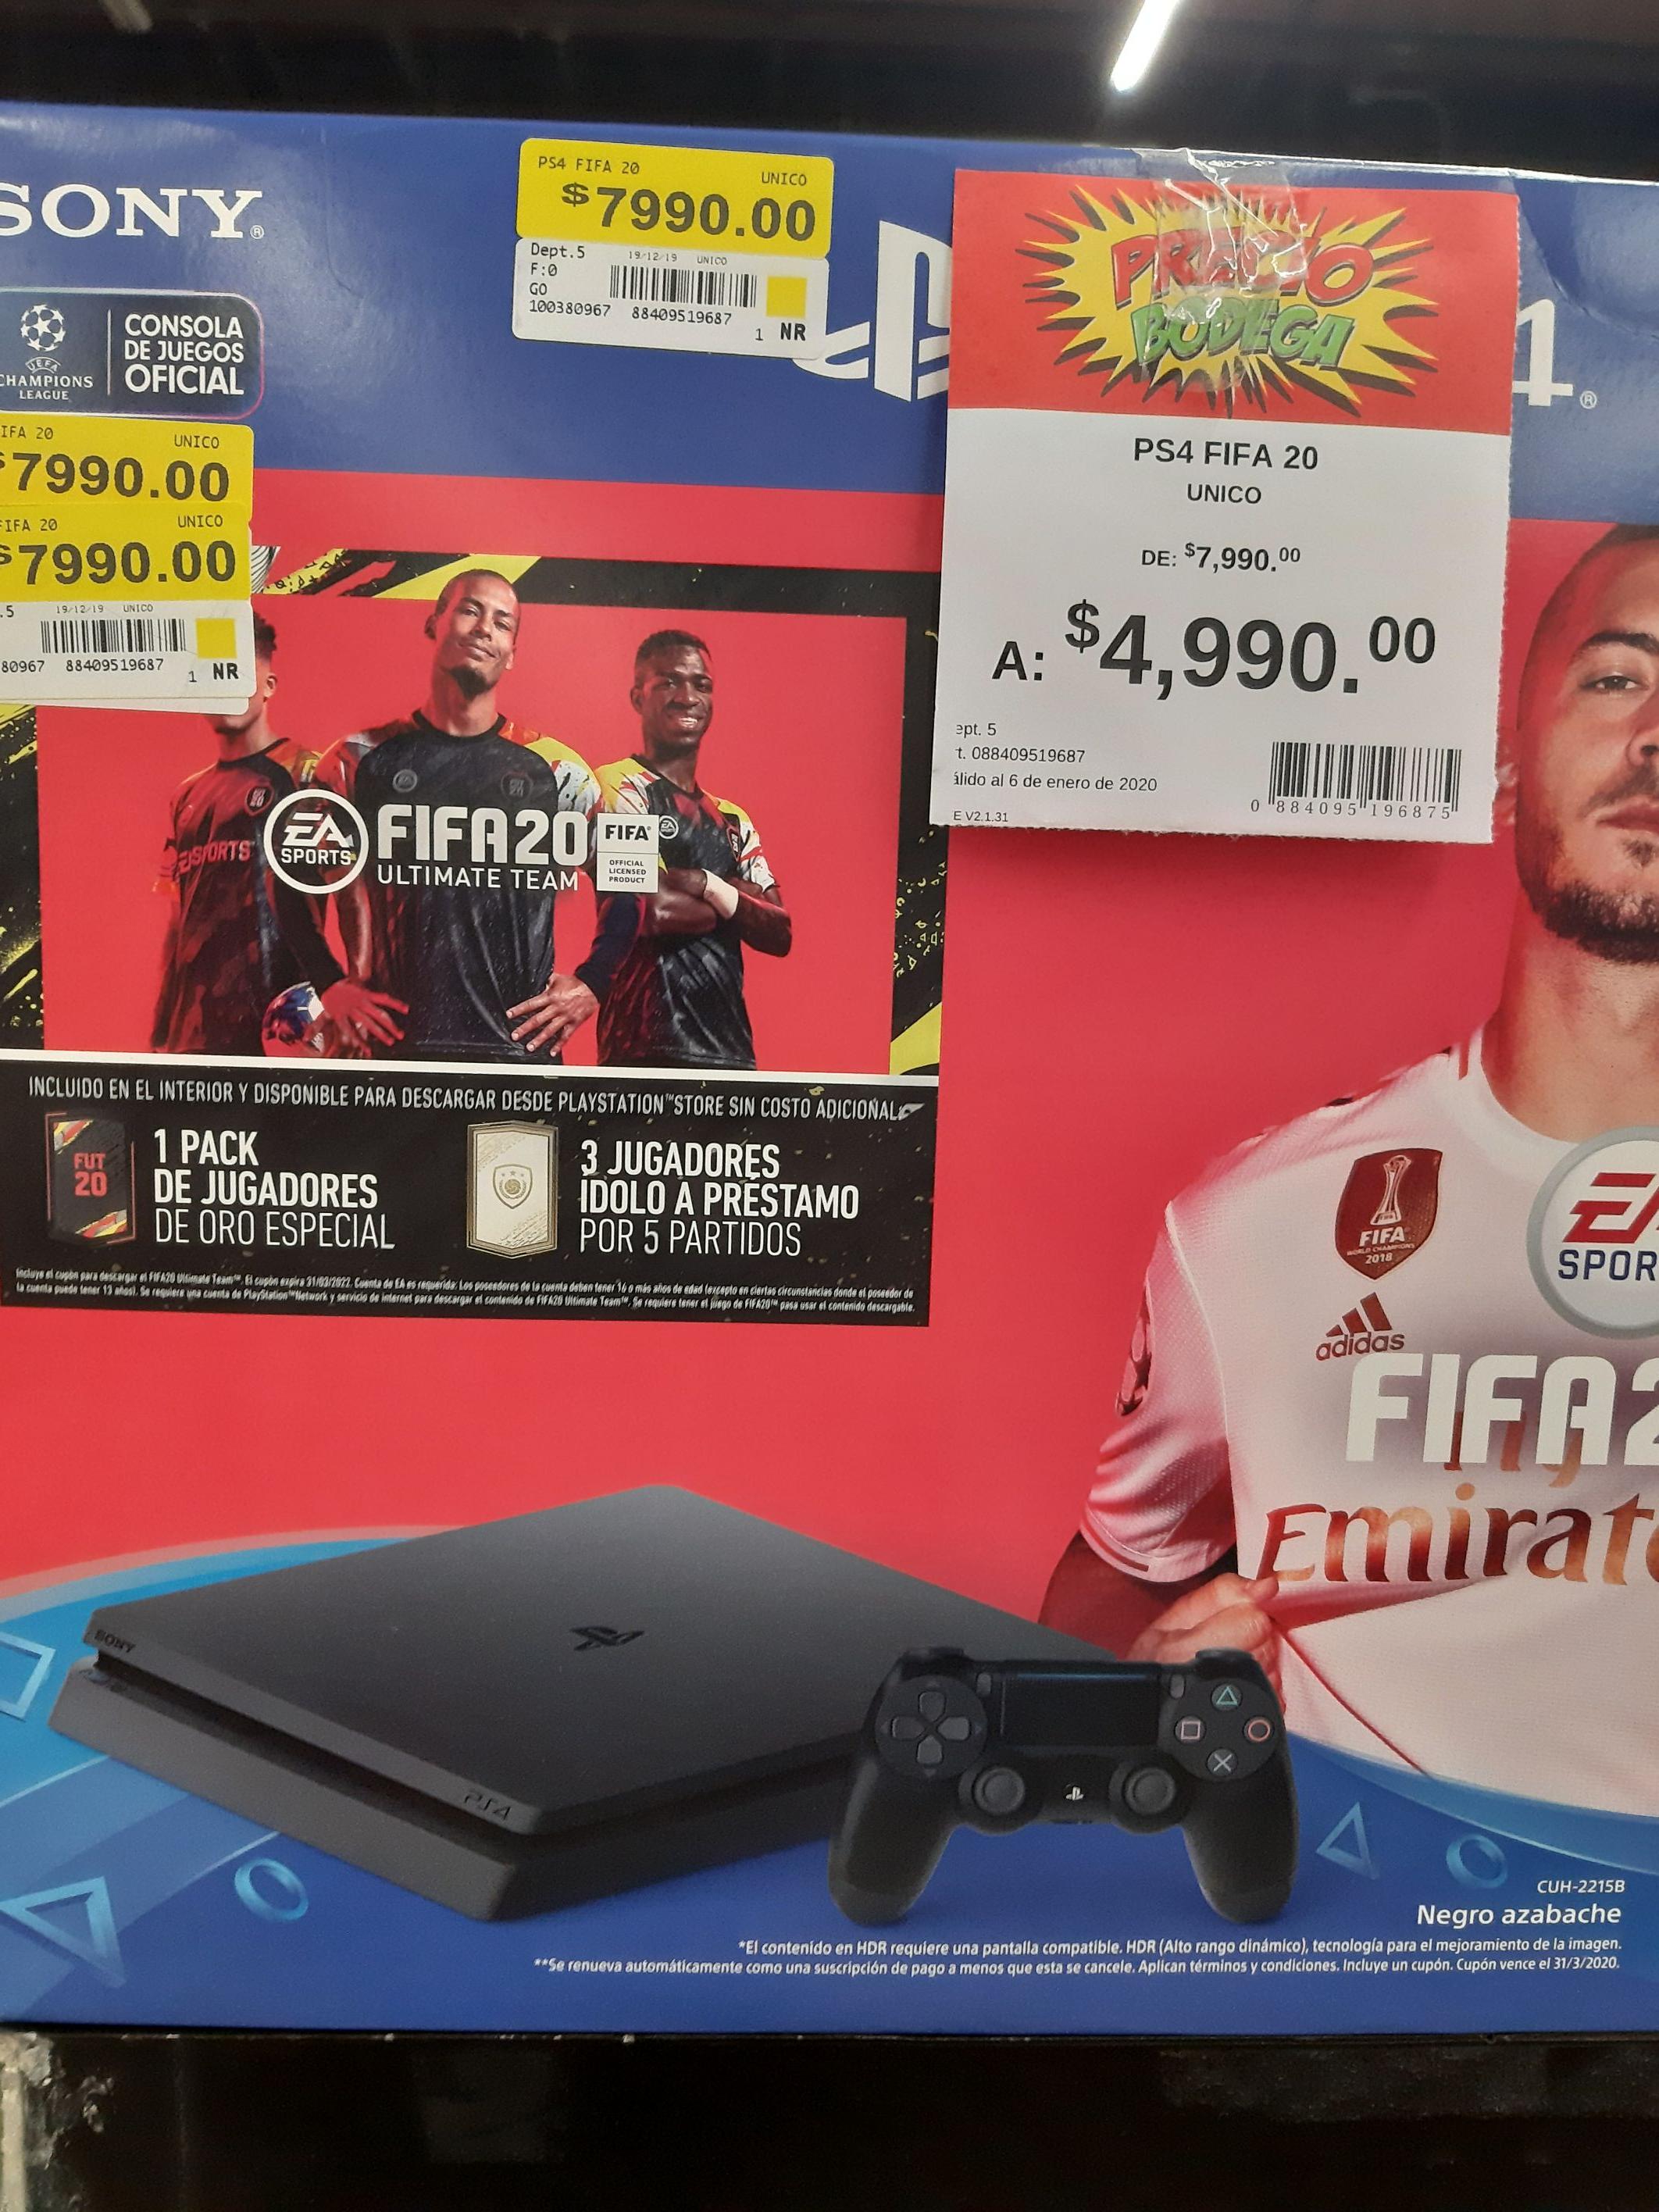 Bodega Aurrera: PlayStation 4 + Fifa